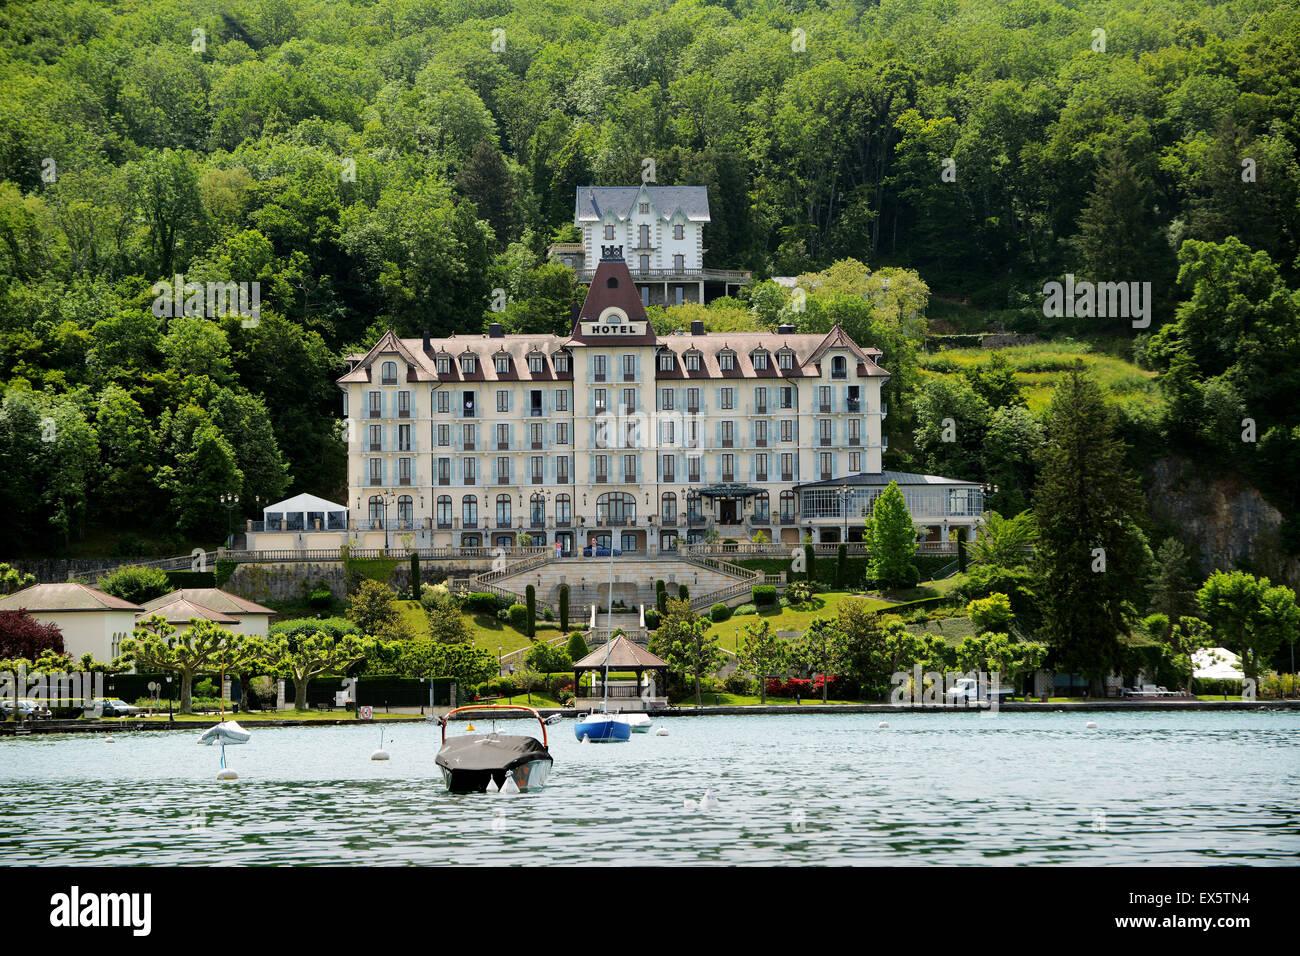 Hotel Palace Menthon